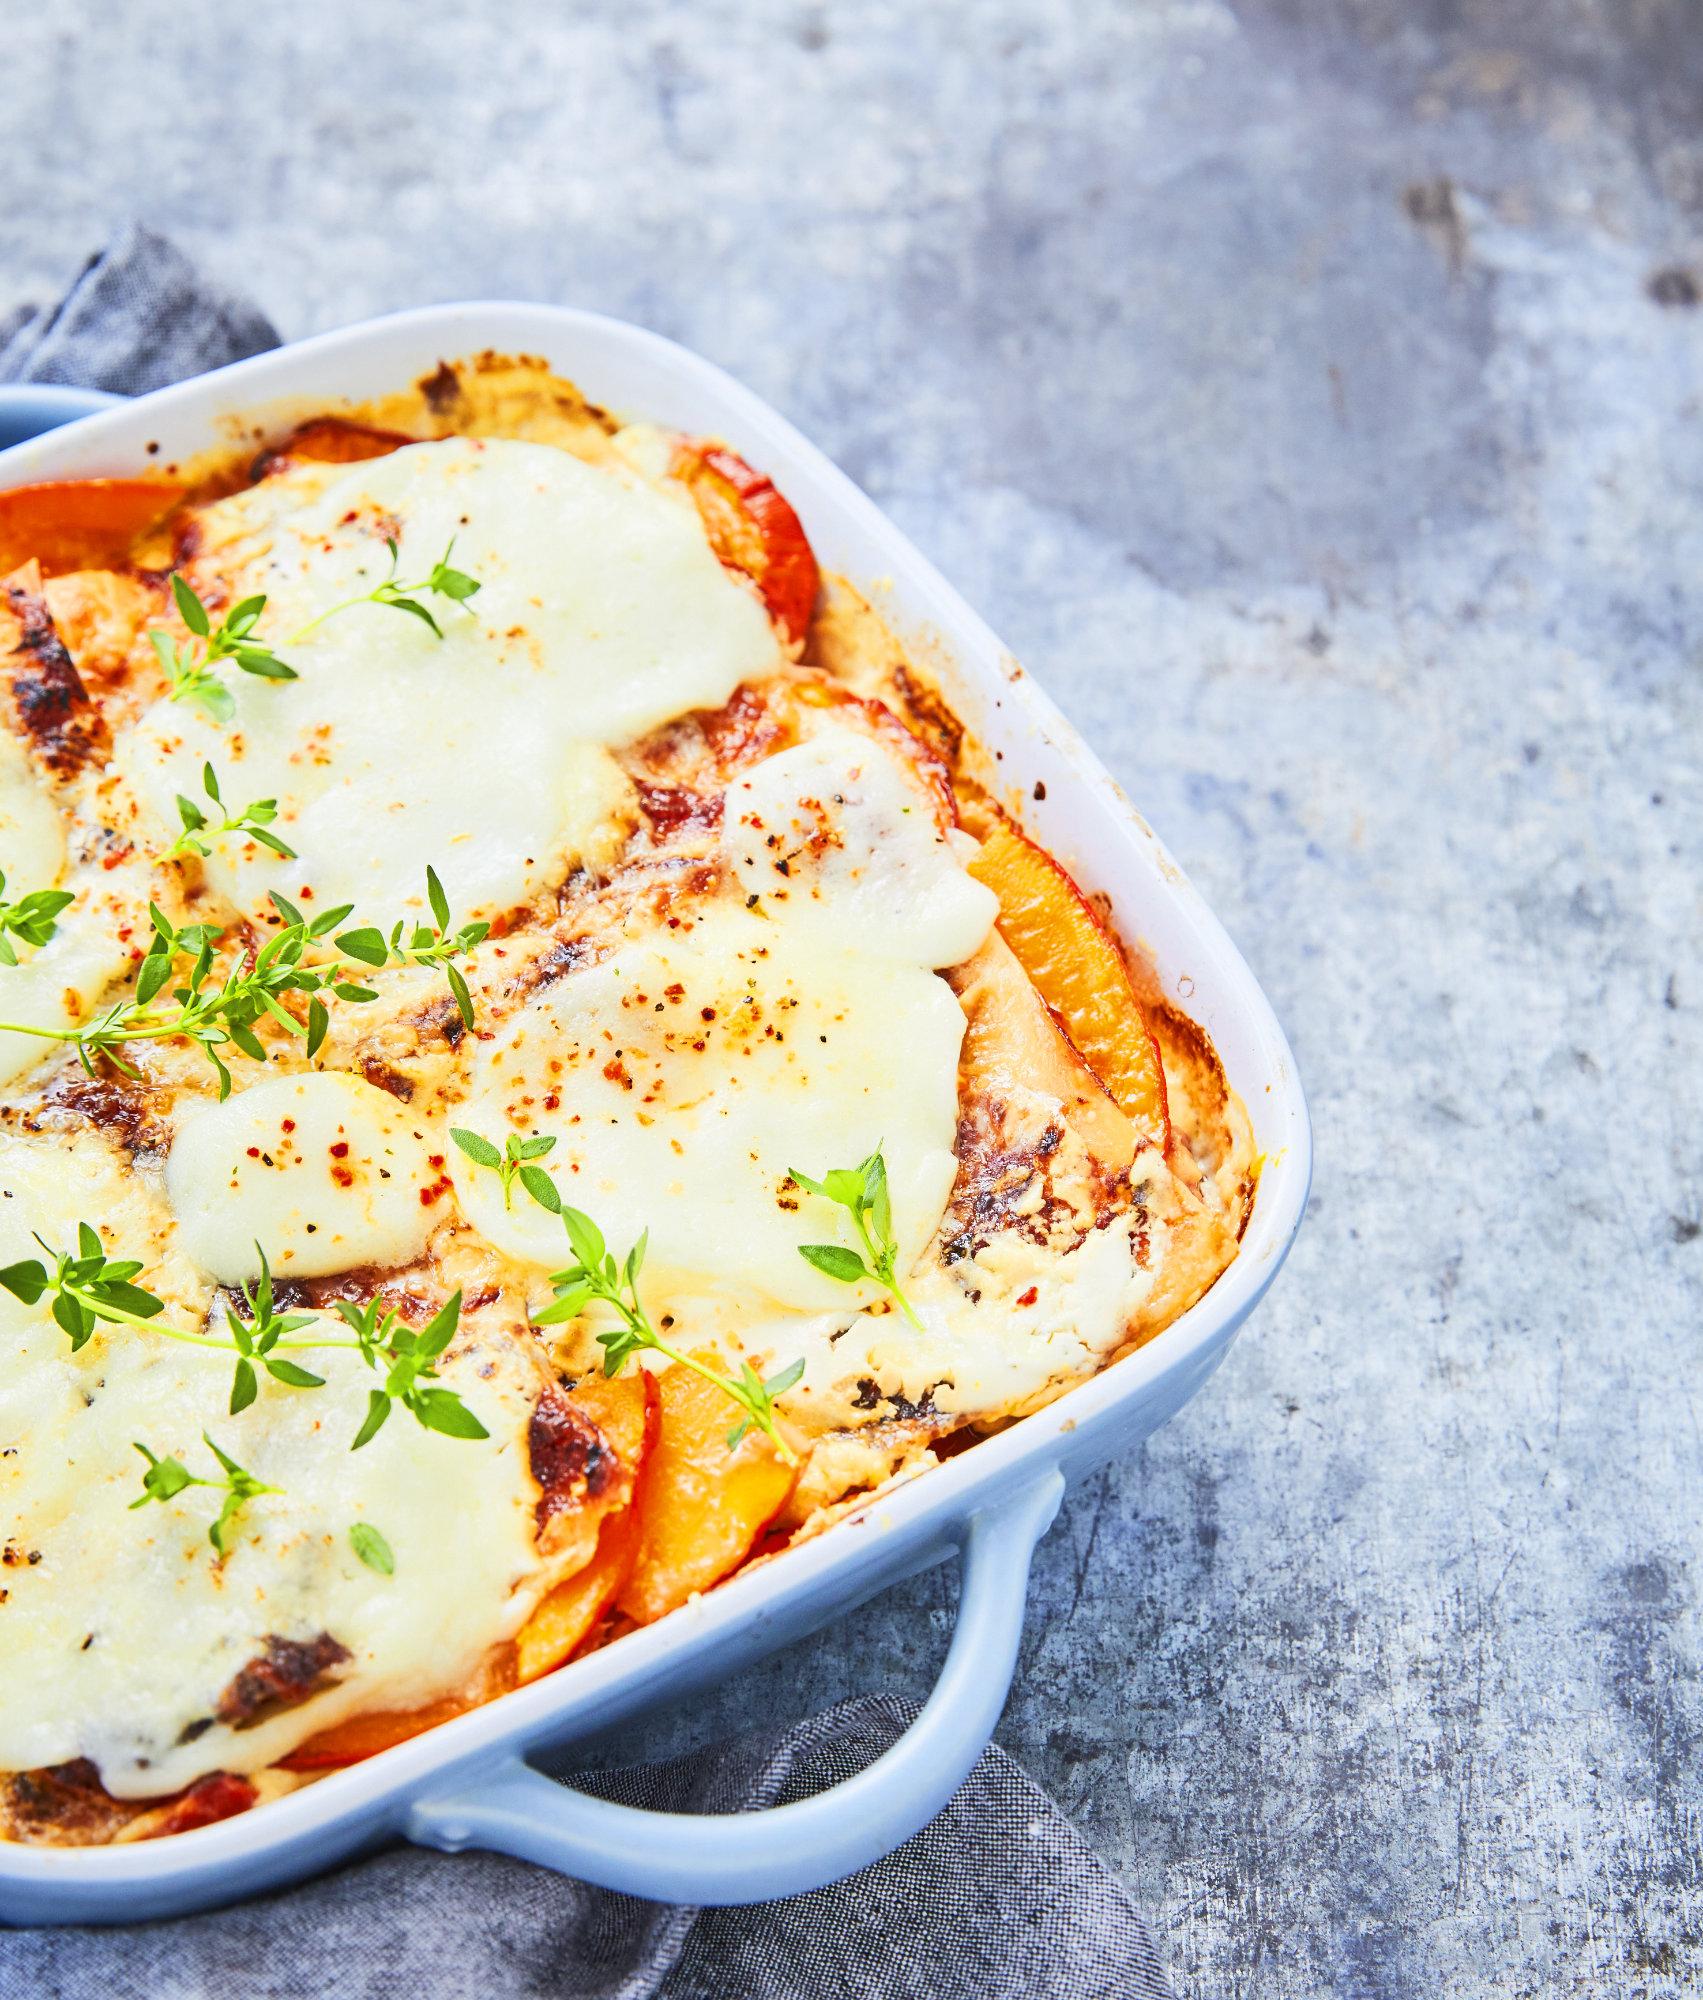 Kürbis-Lasagne mit Bergkäse und Mozzarella